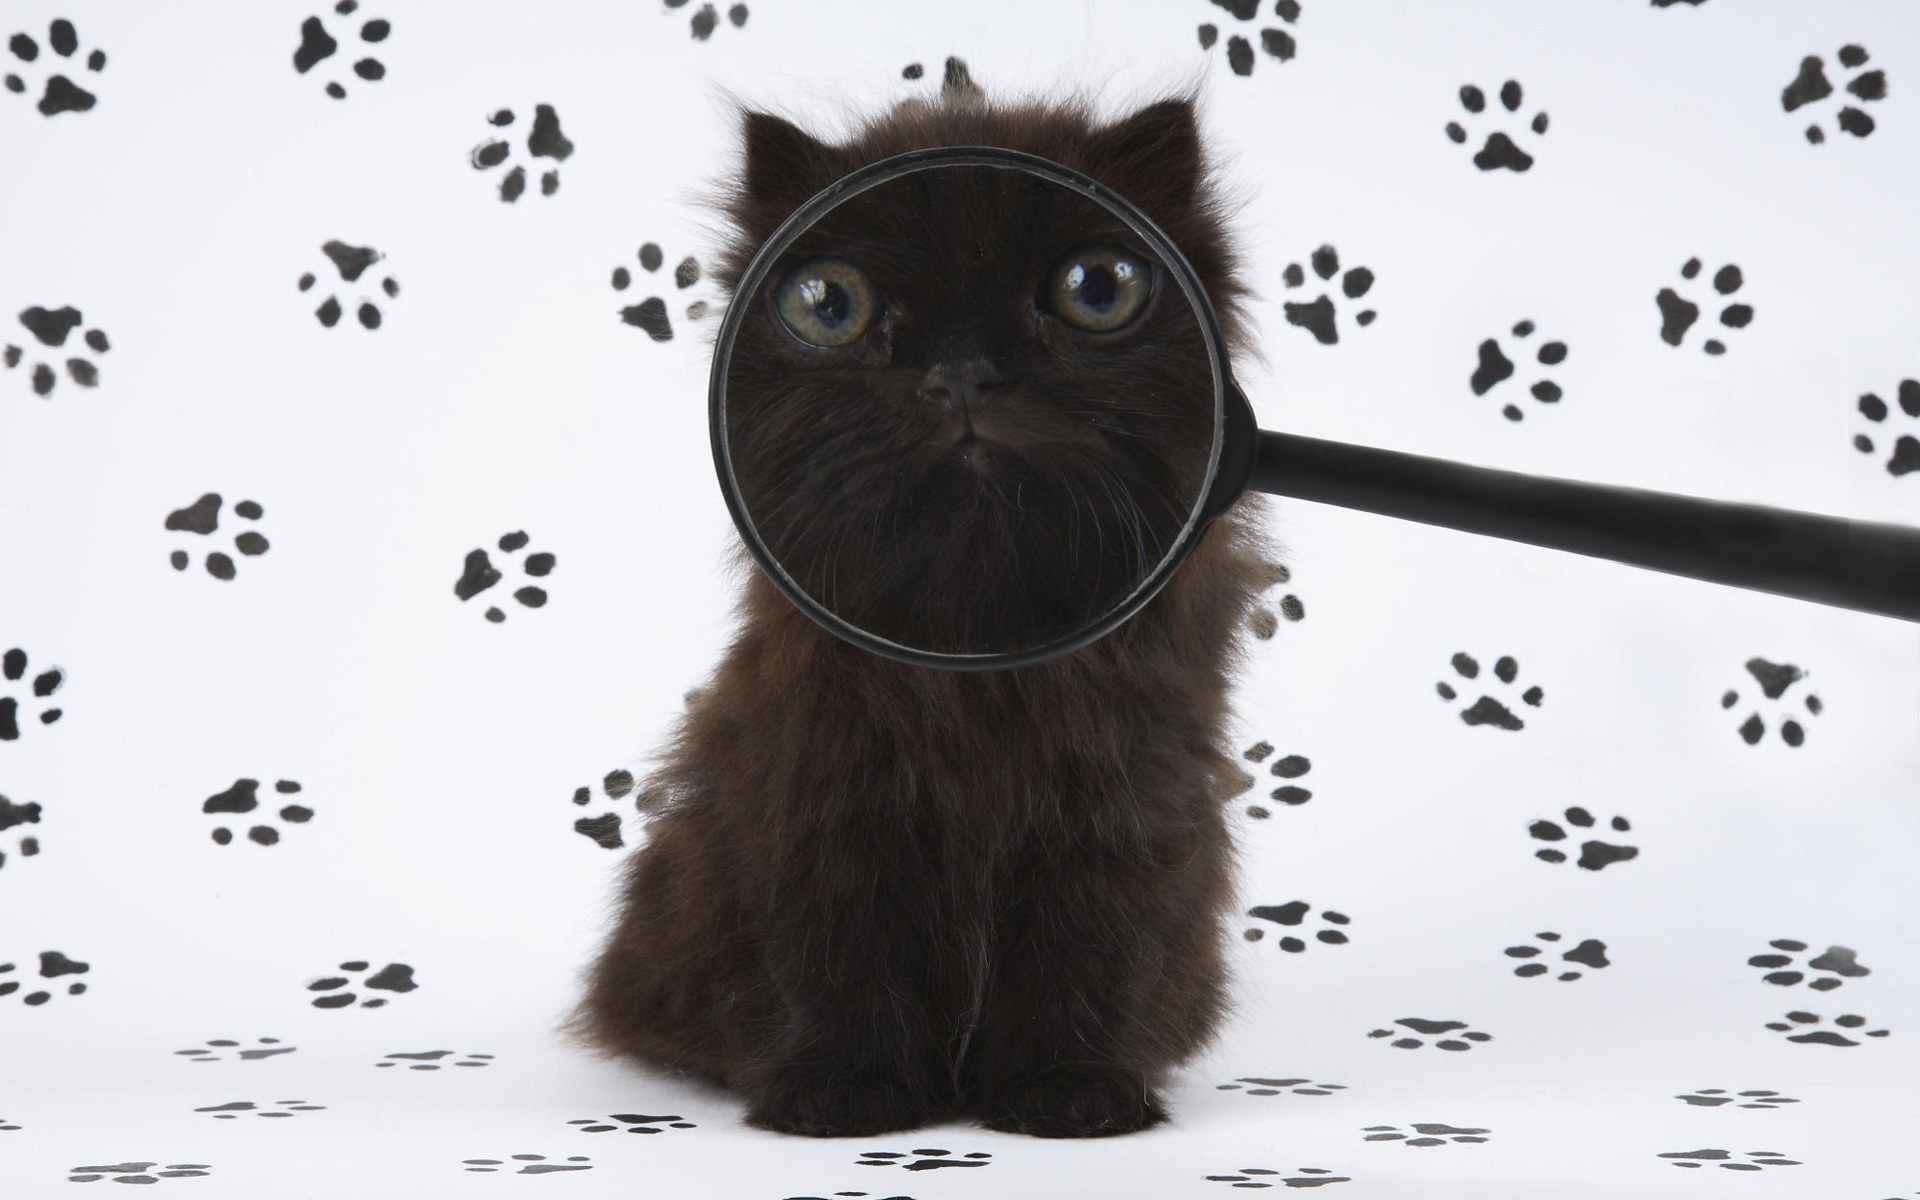 Image: Kitten, black, magnifier, muzzle, eyes, paws, traces, prints, white background